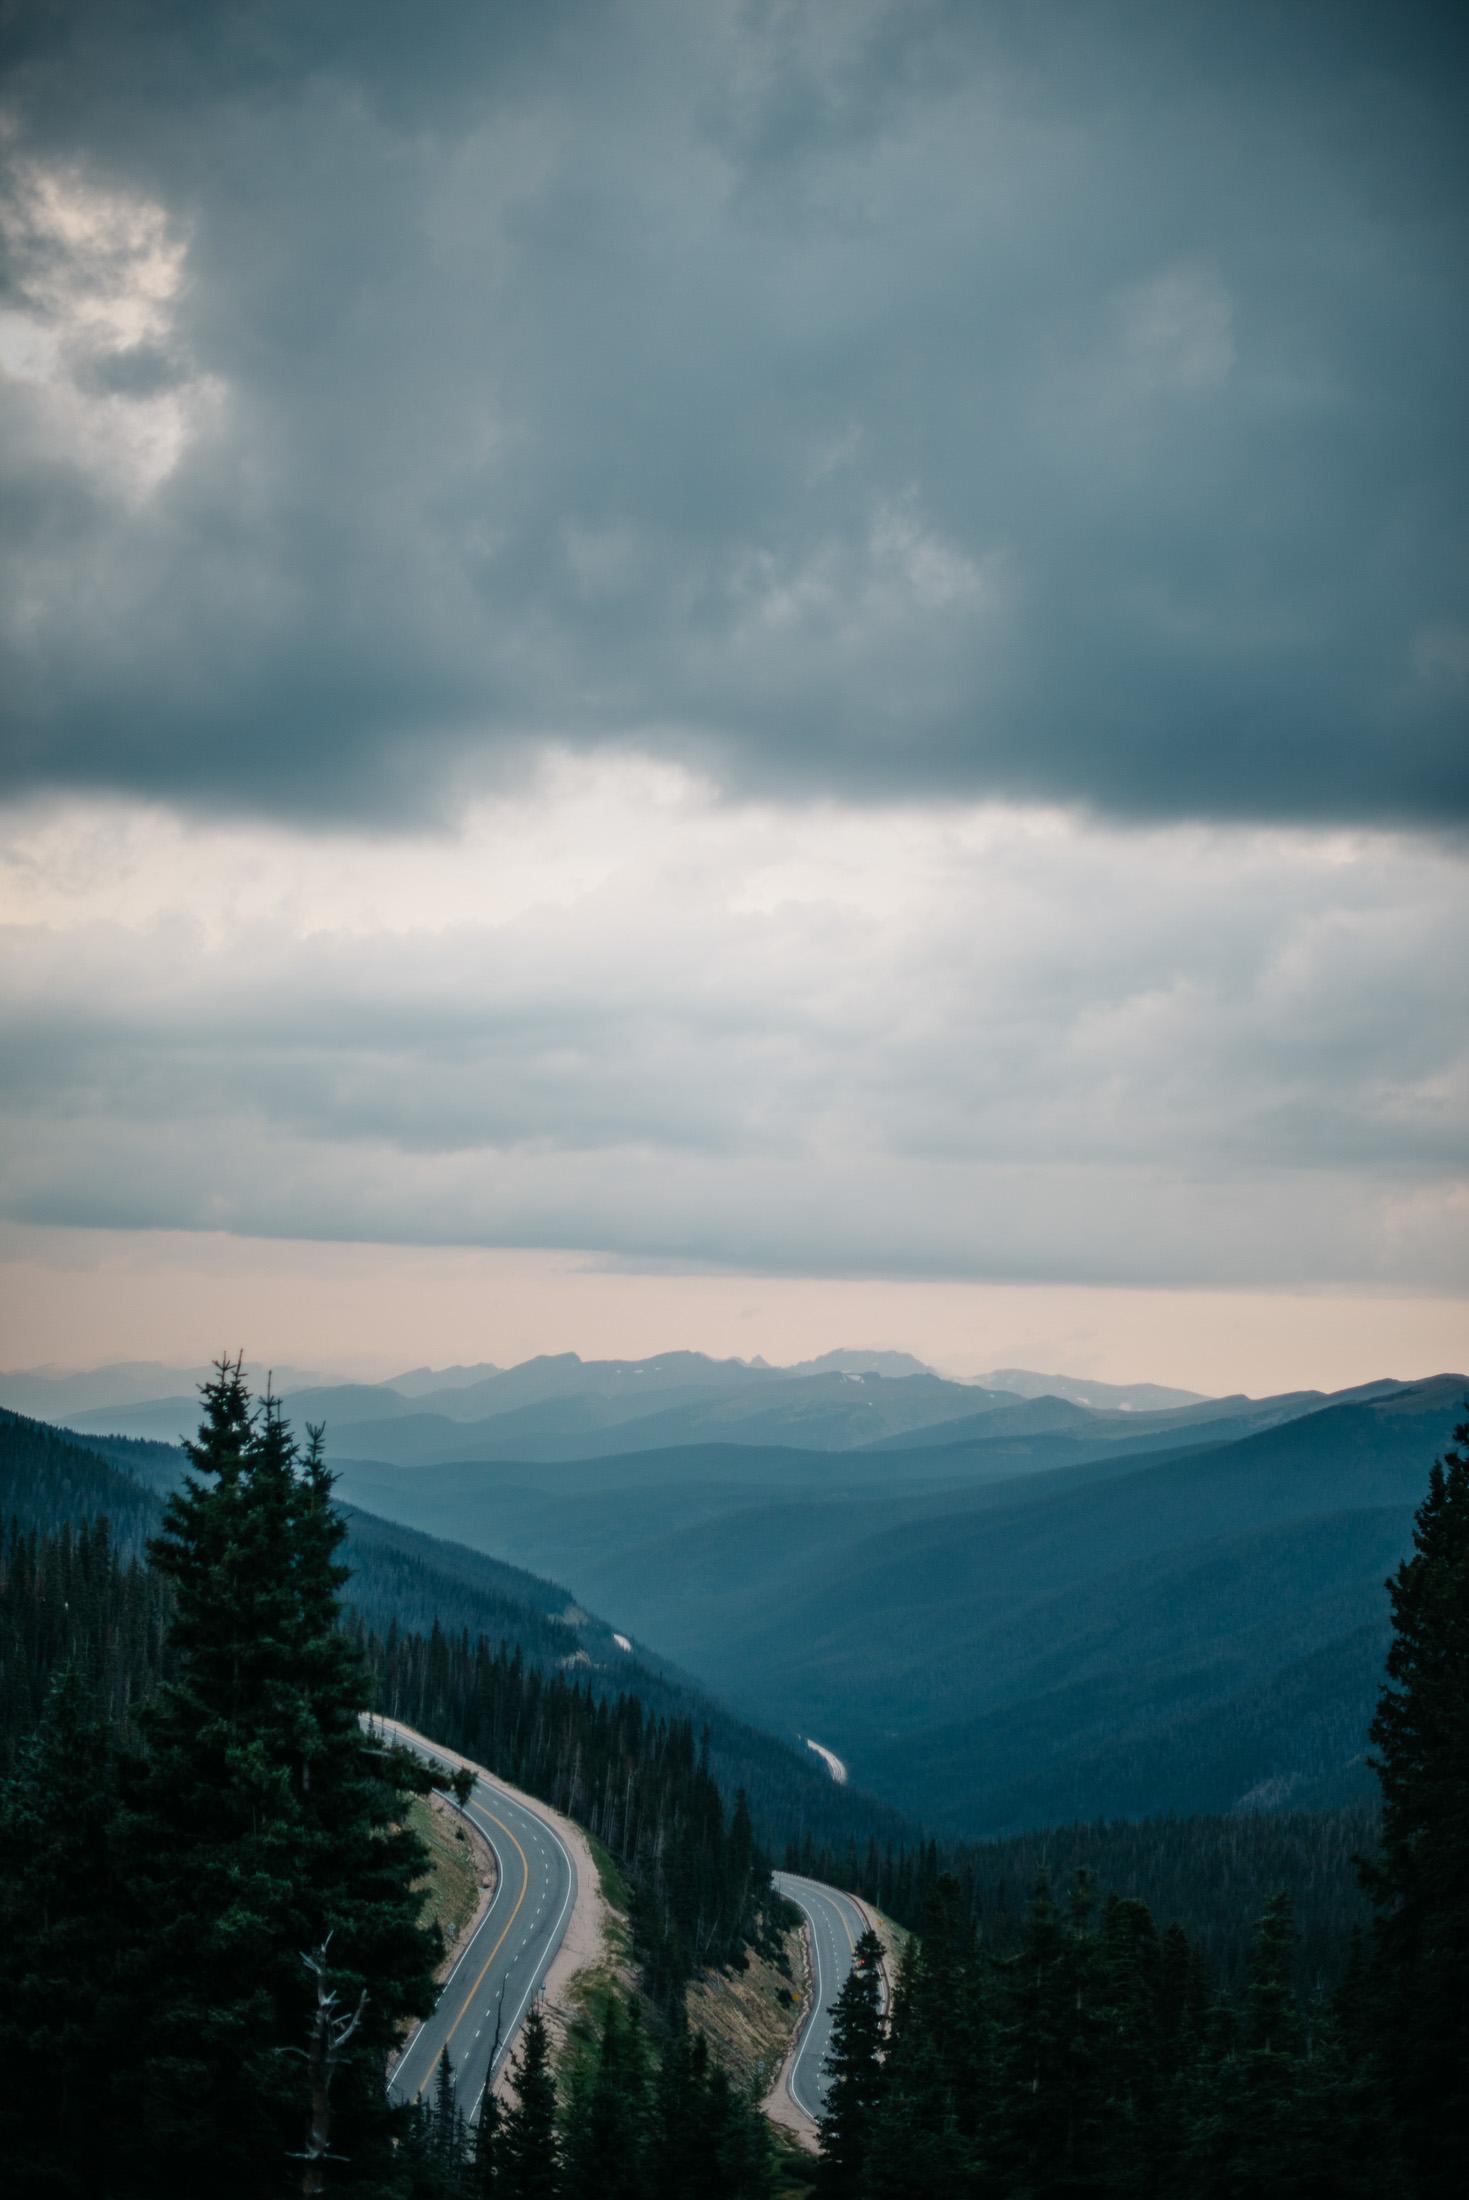 108elopement-photographer-colorado-snow-mountain-ranch-wedding-cynthia&chris-married1586.jpg